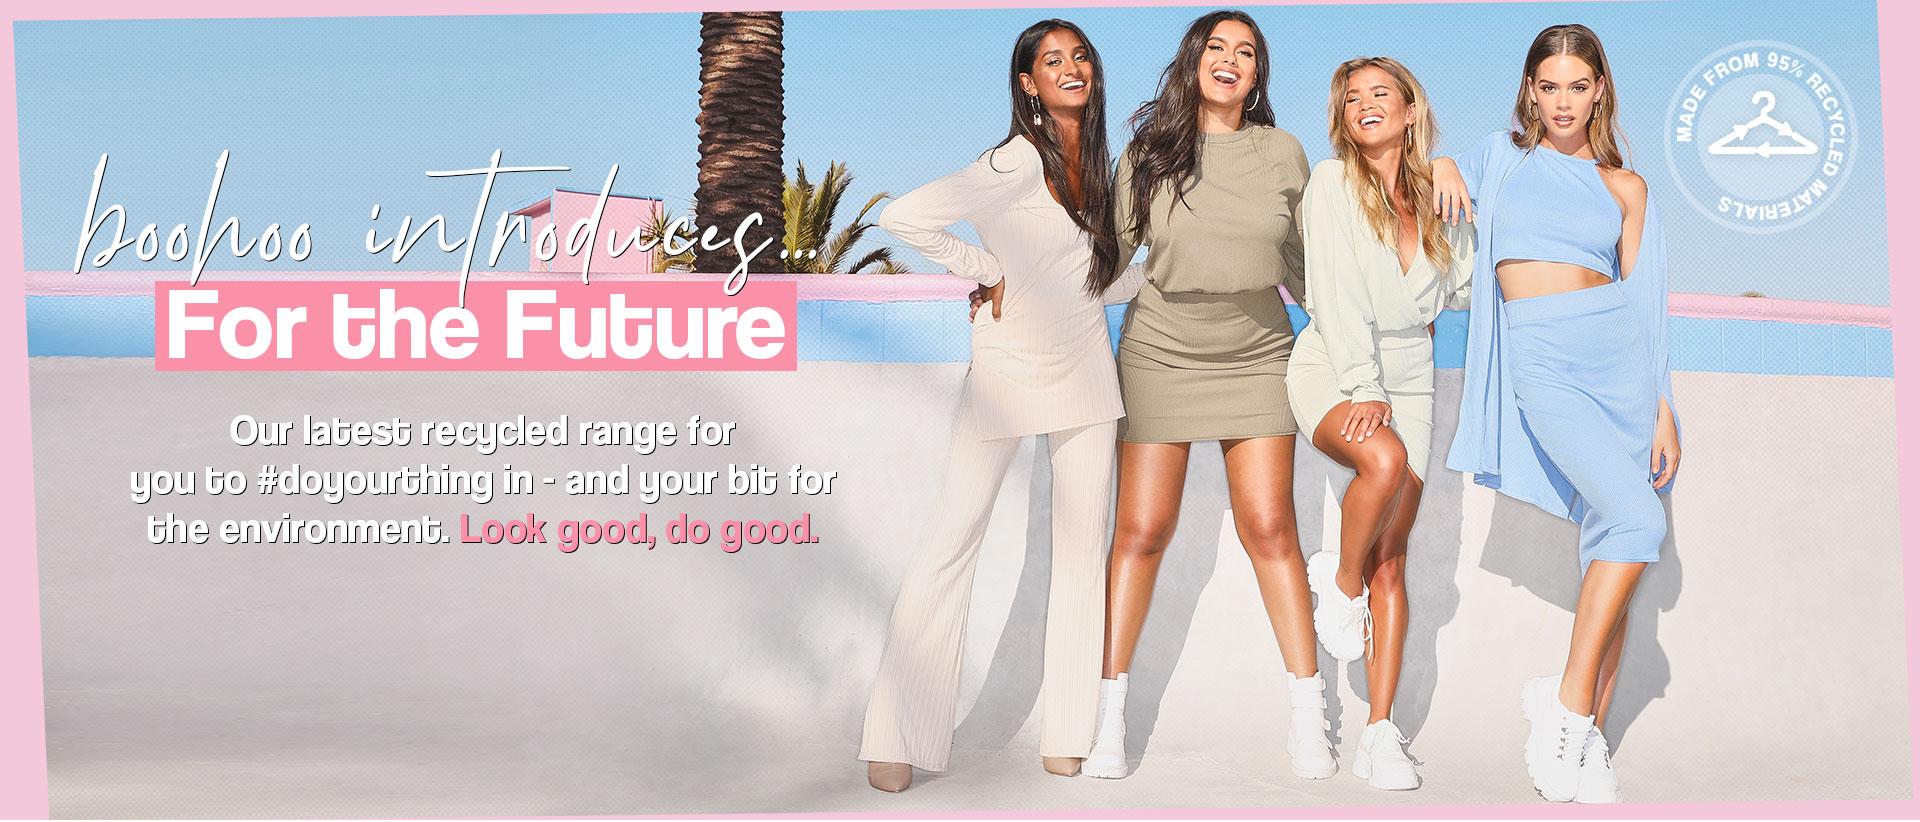 Clothes | Women's & Men's Clothing & Fashion | Online